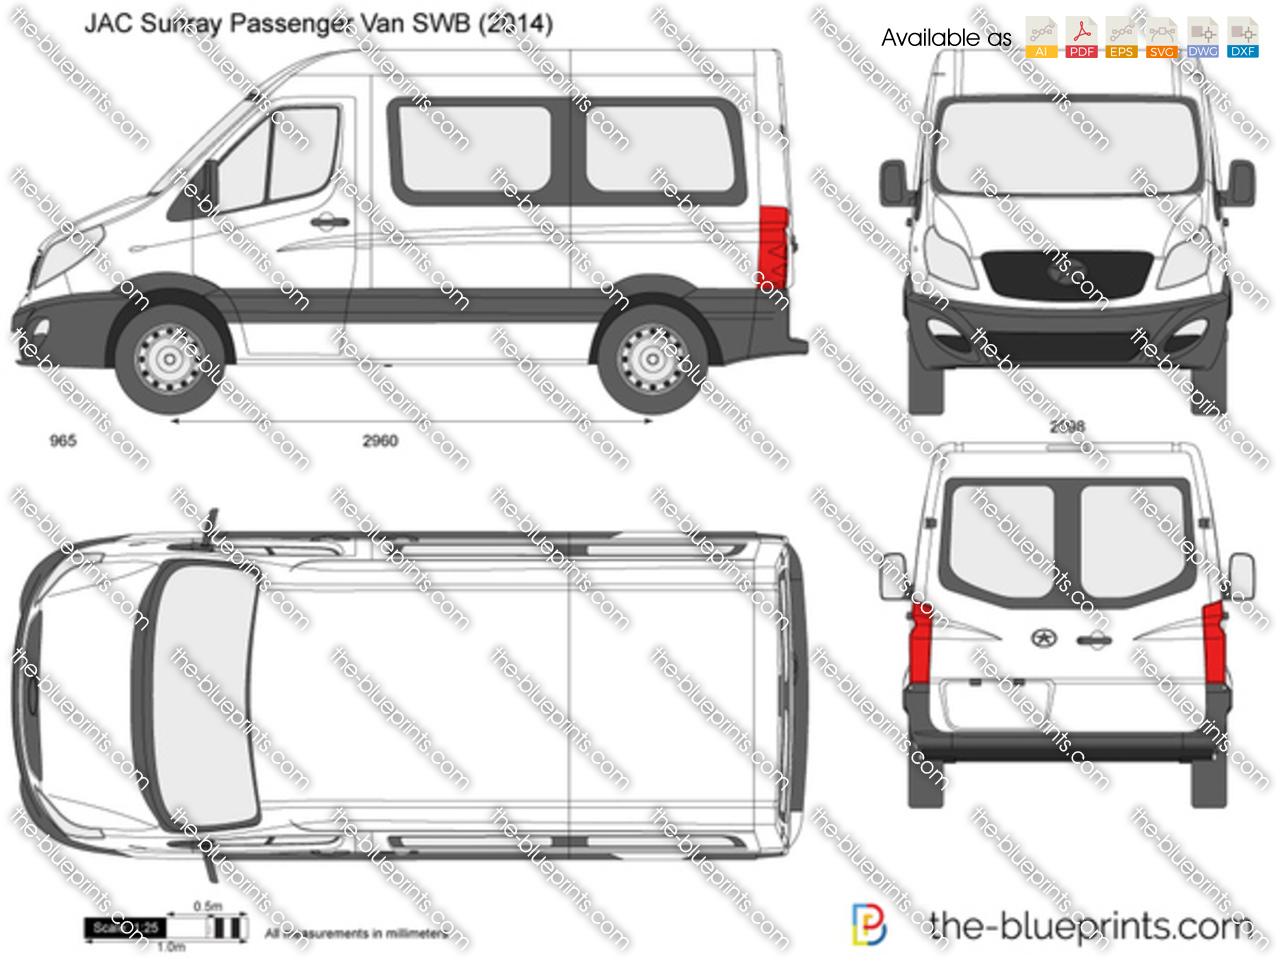 JAC Sunray Passenger Van SWB